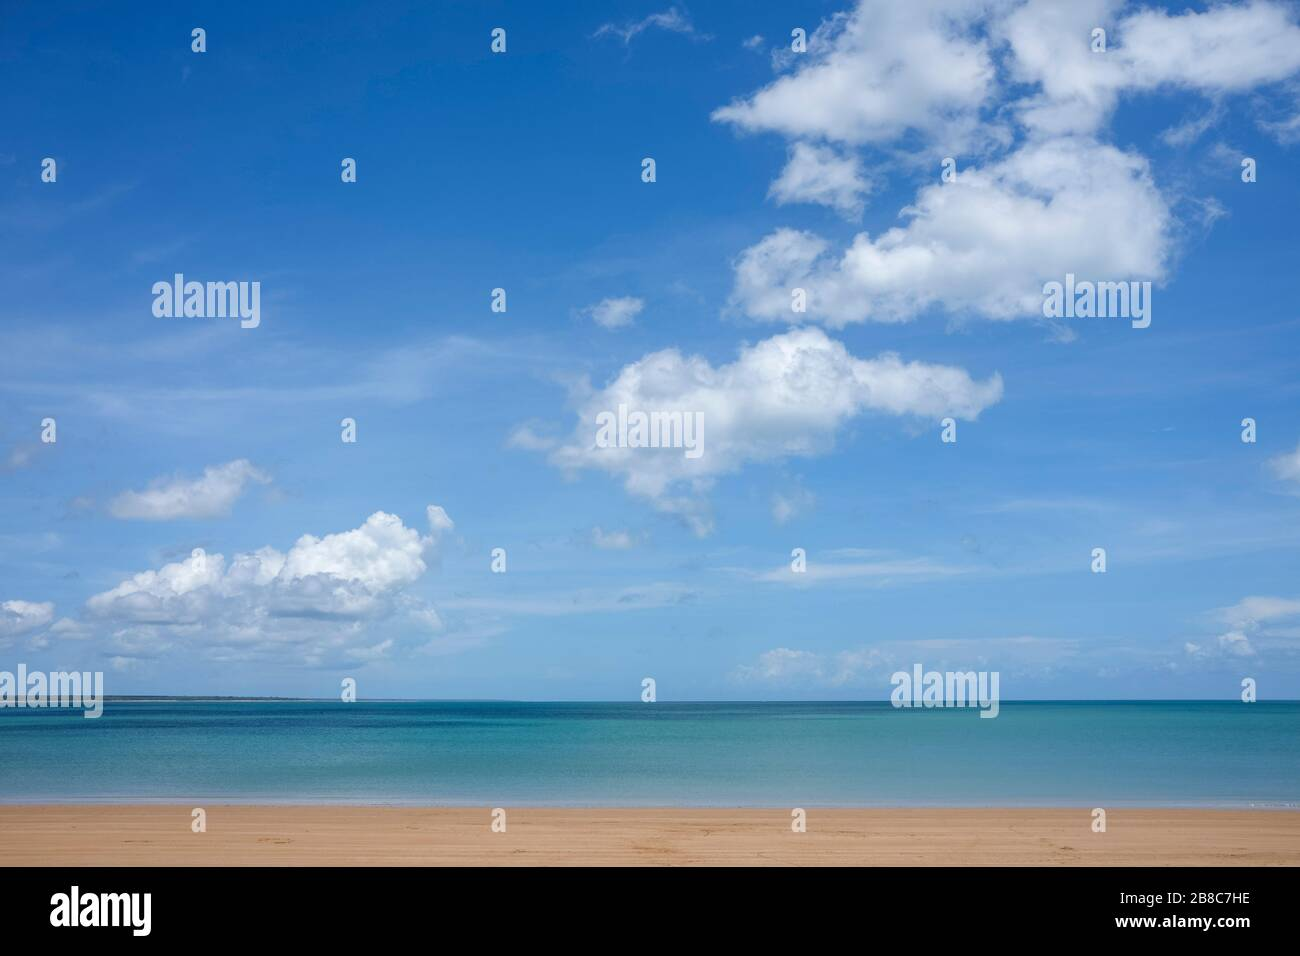 vesteys-beach-in-darwin-northern-territo